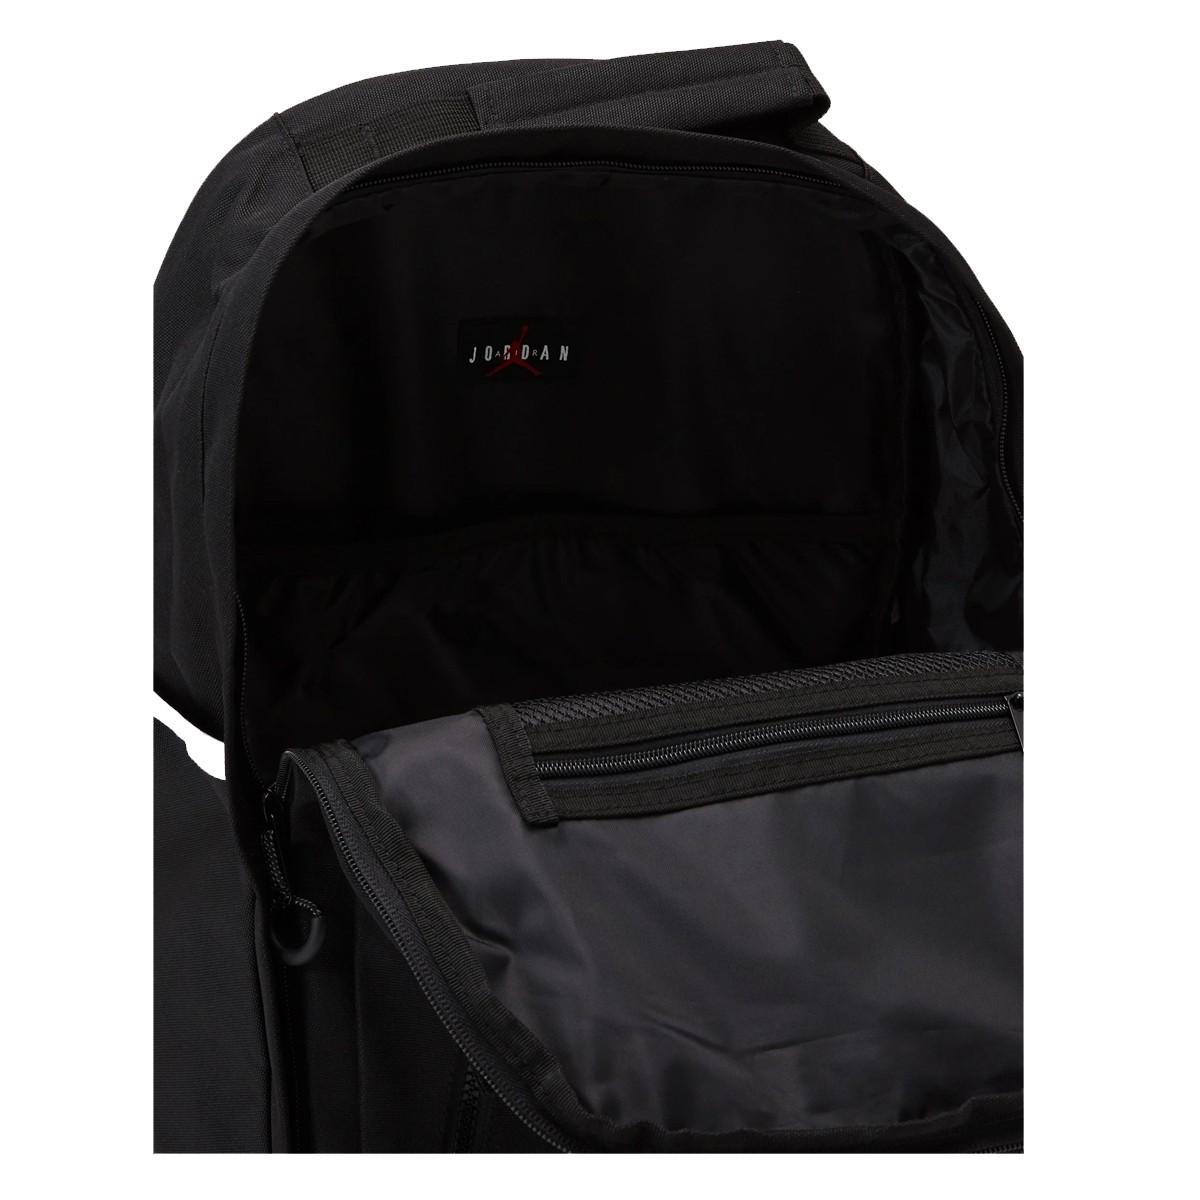 Jordan Air Performance Pack 'Black'-9A0467-023